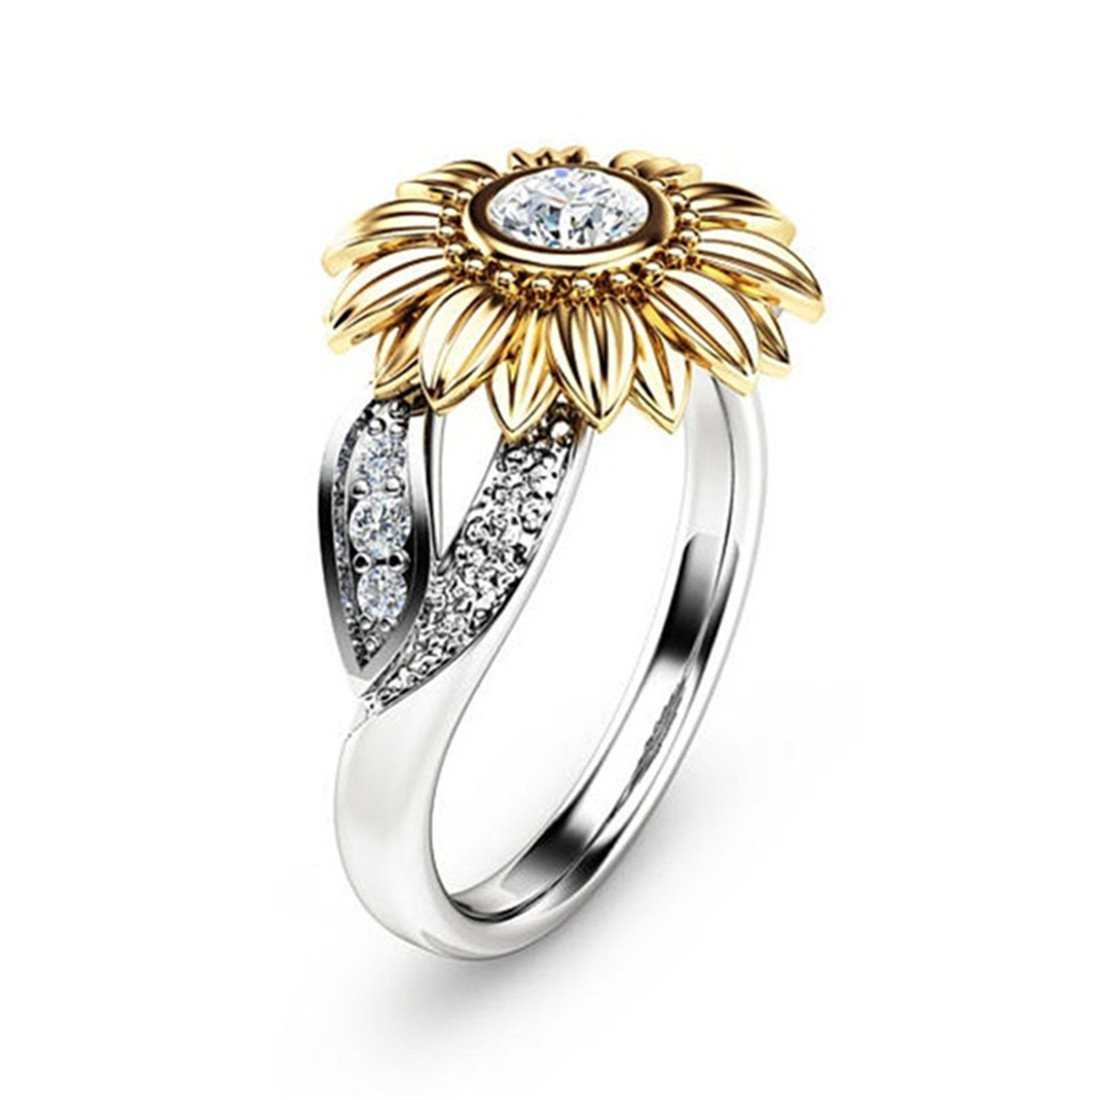 DALARAN Cubic Zirconia Ring for Women Cushion Solitaire Leaf Band Wedding Enagement Ring Size 8